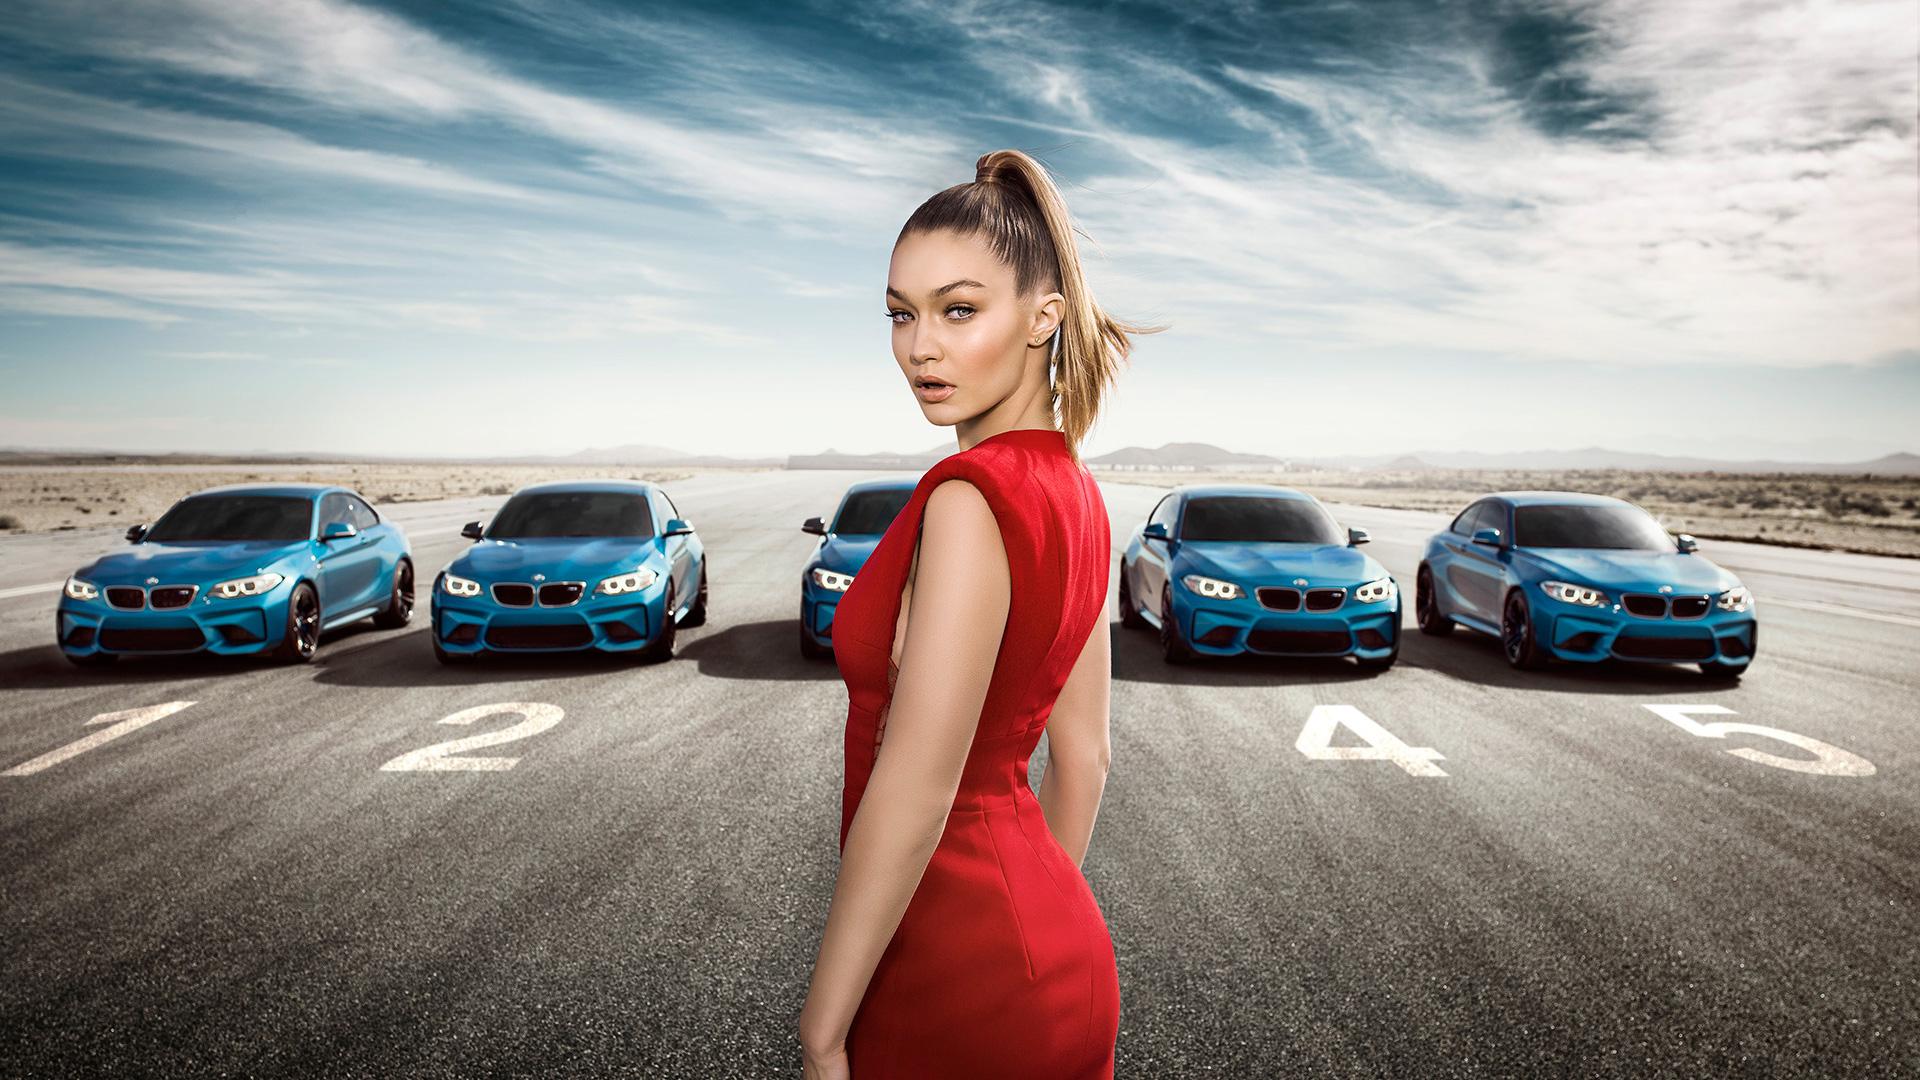 Allens Car Show